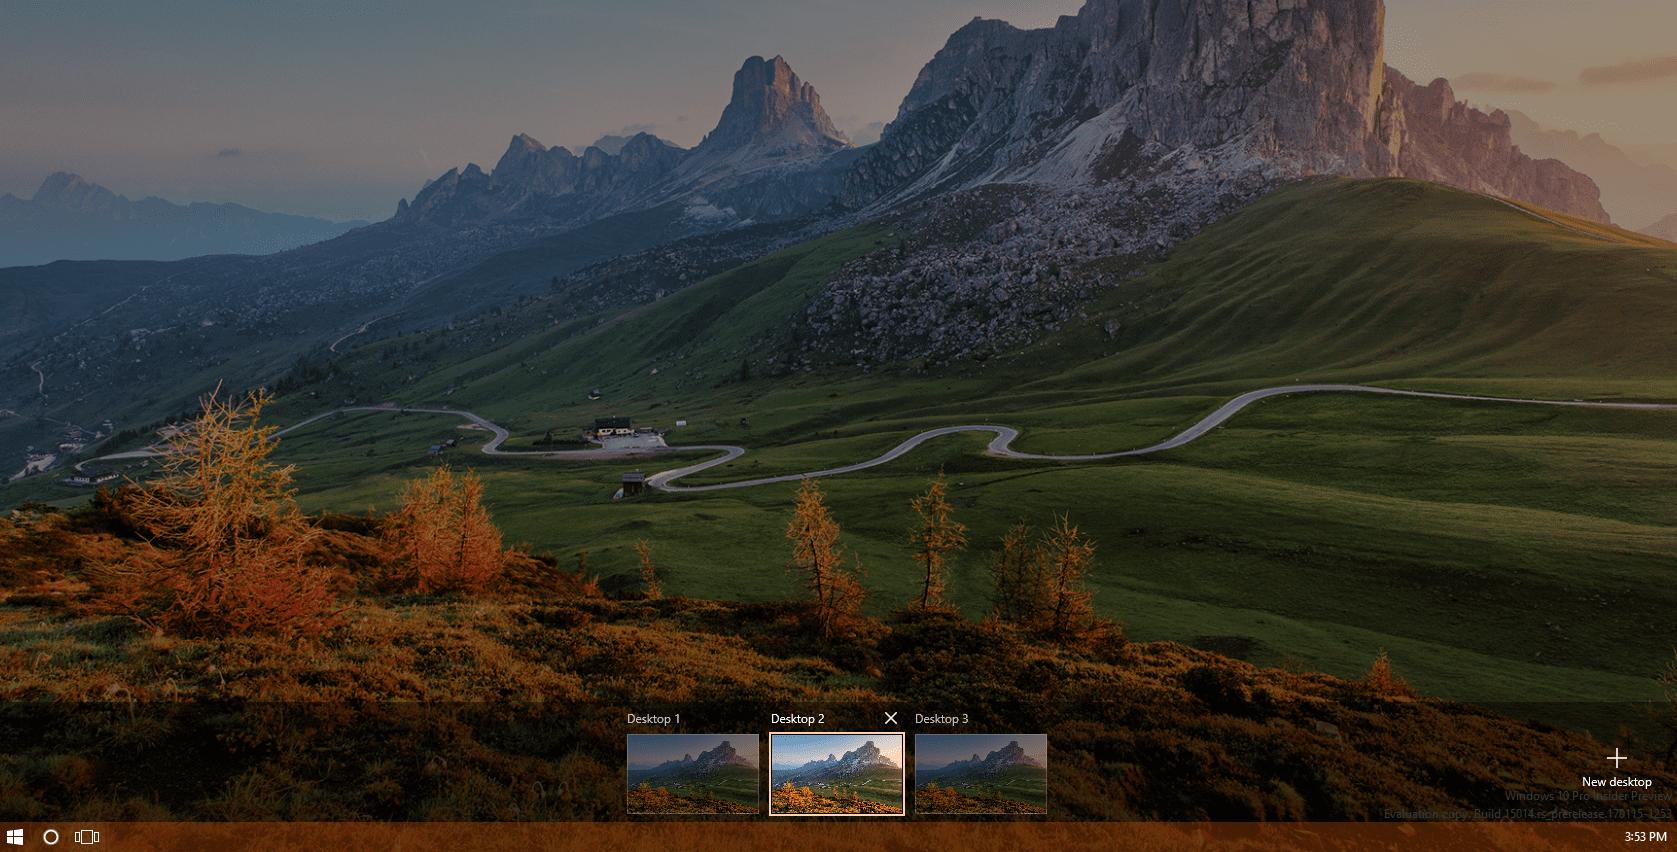 How To Set Spotlight Lock Screen Image As Wallpaper On Windows 10